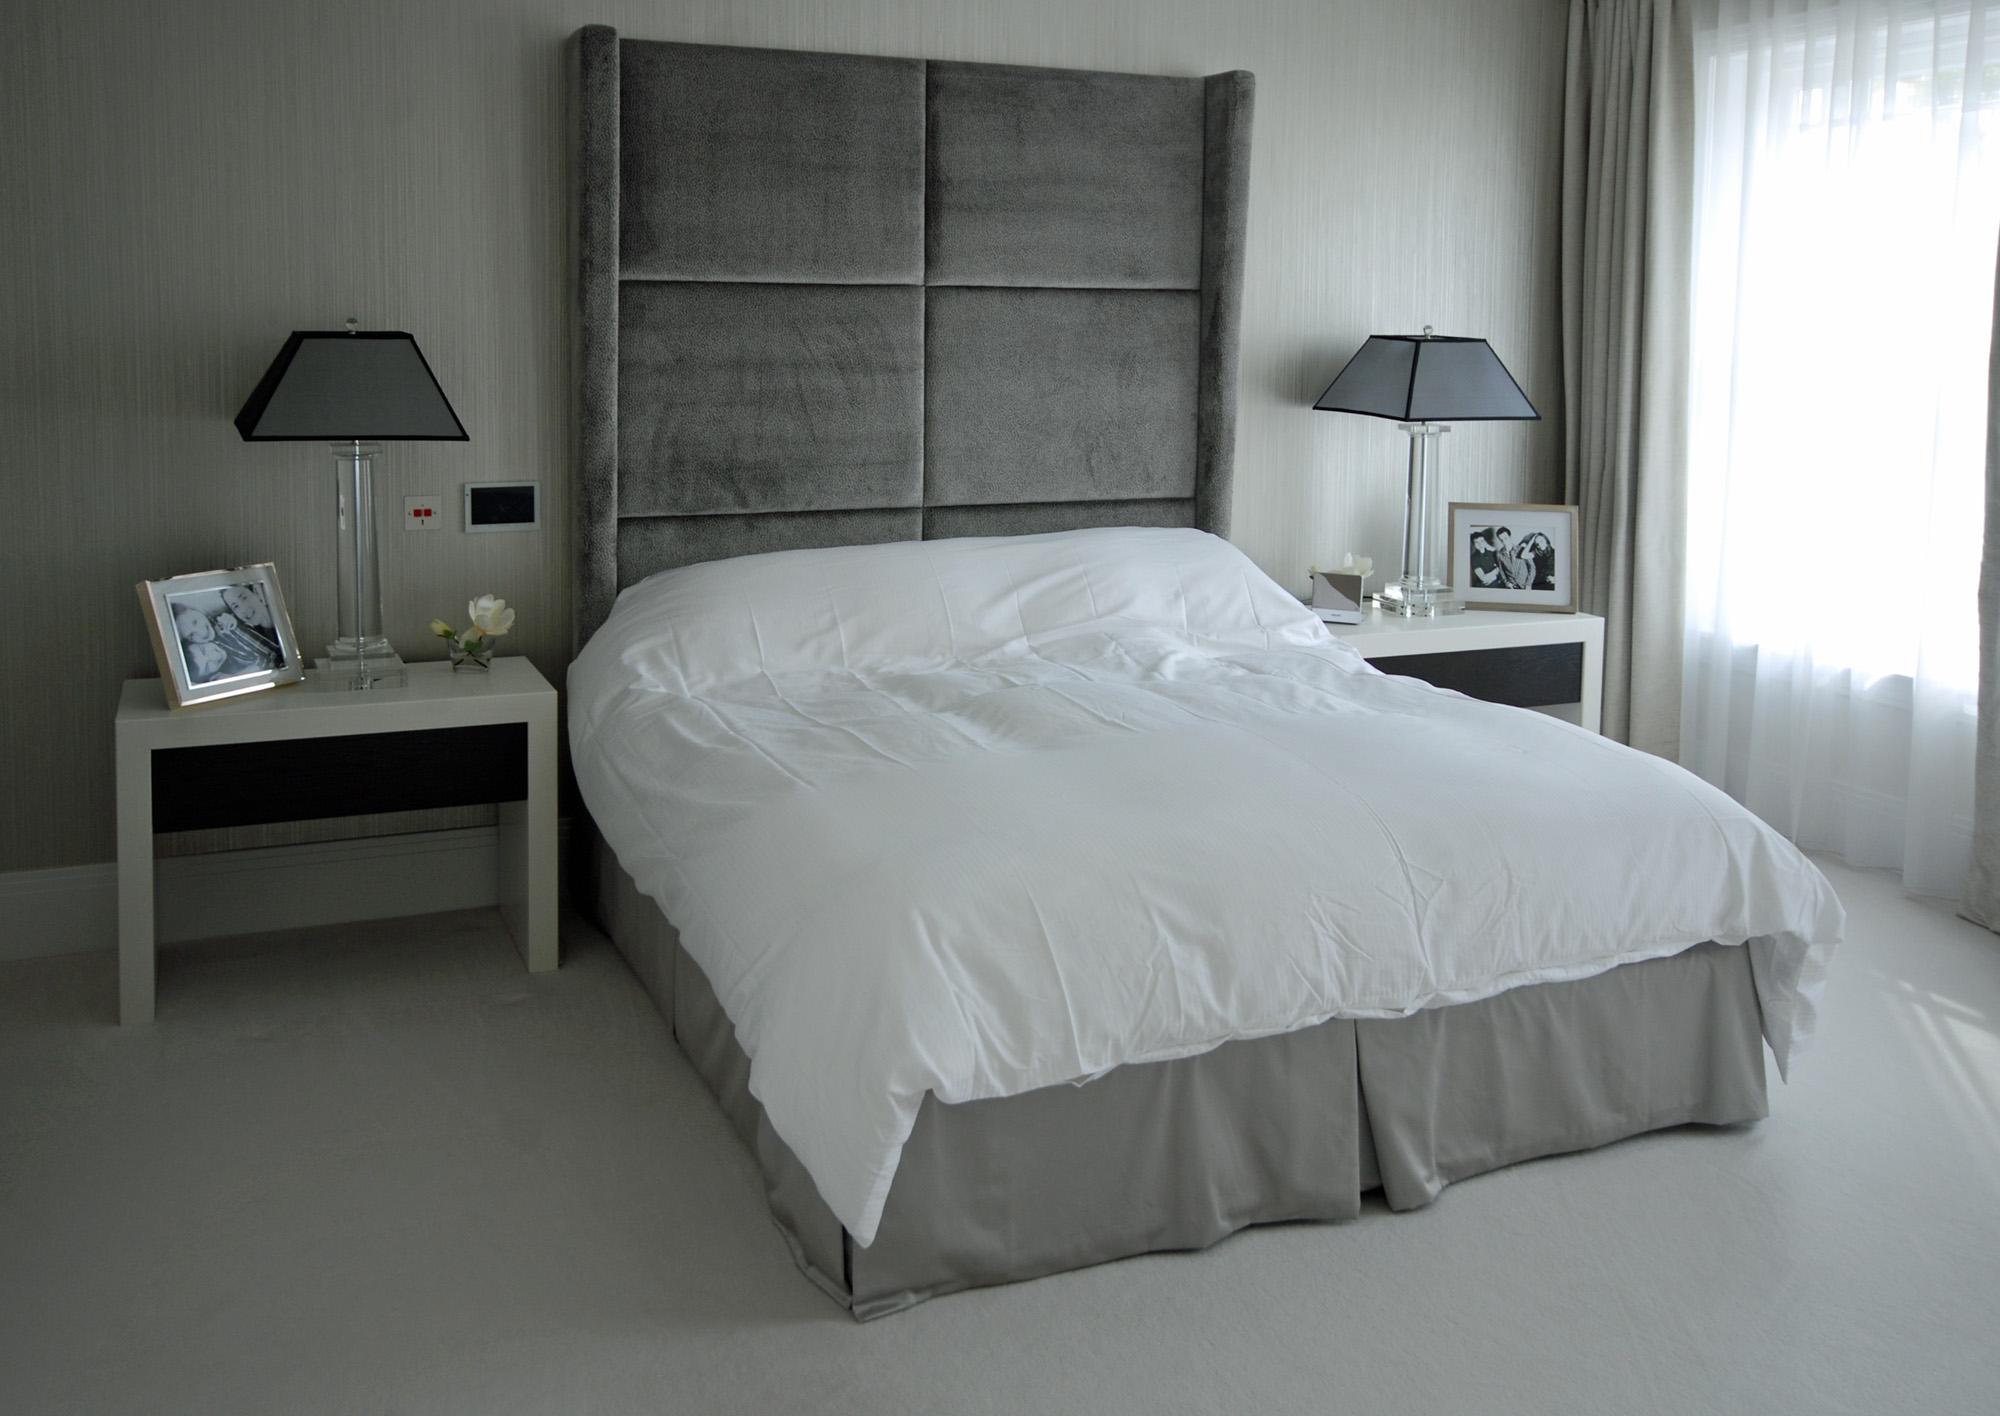 Cream Painted Bedroom Furniture